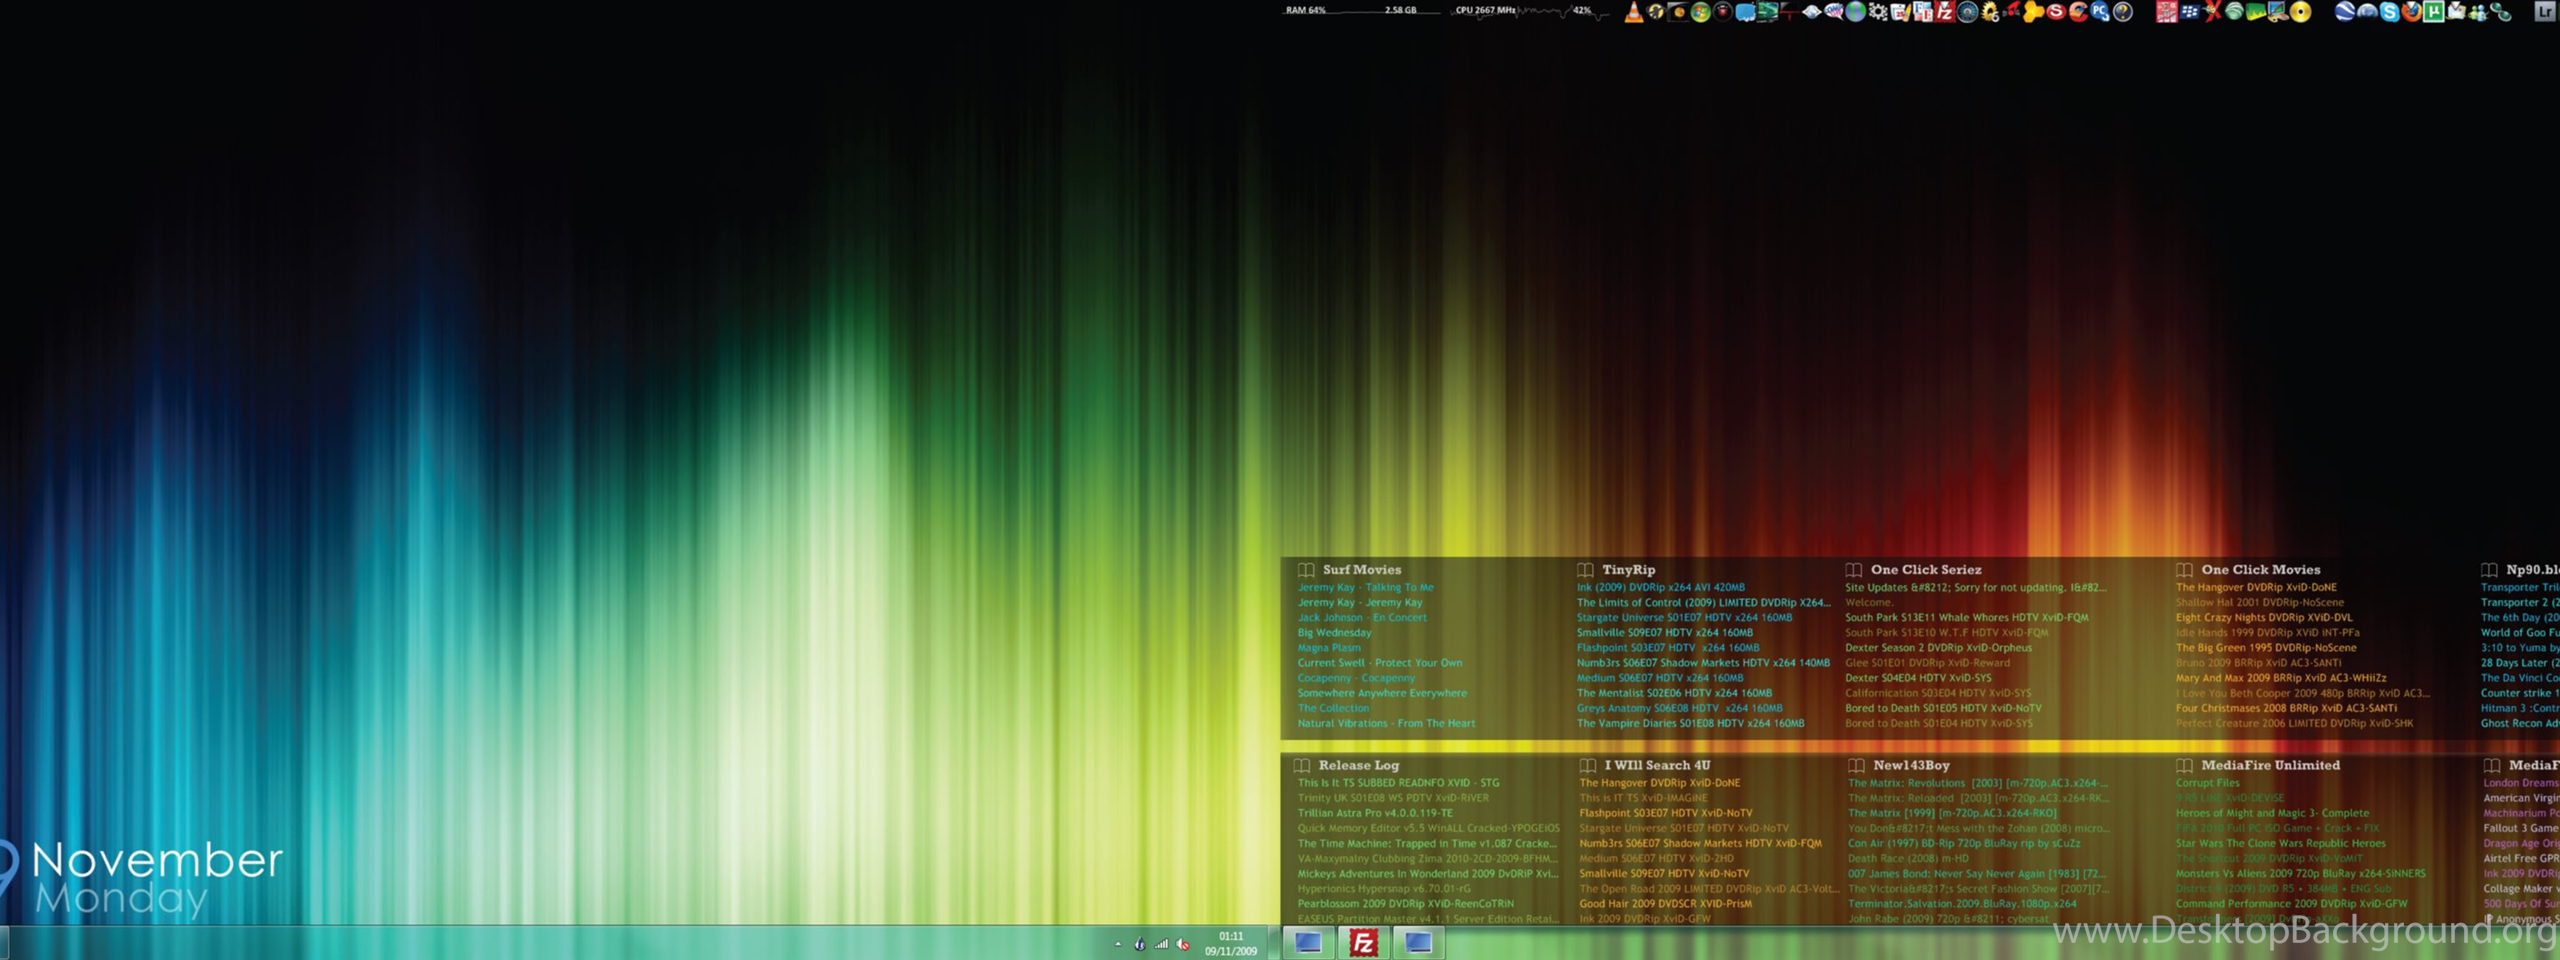 Dual Screen Wallpapers Windows 7 Wallpapers Zone Desktop Background